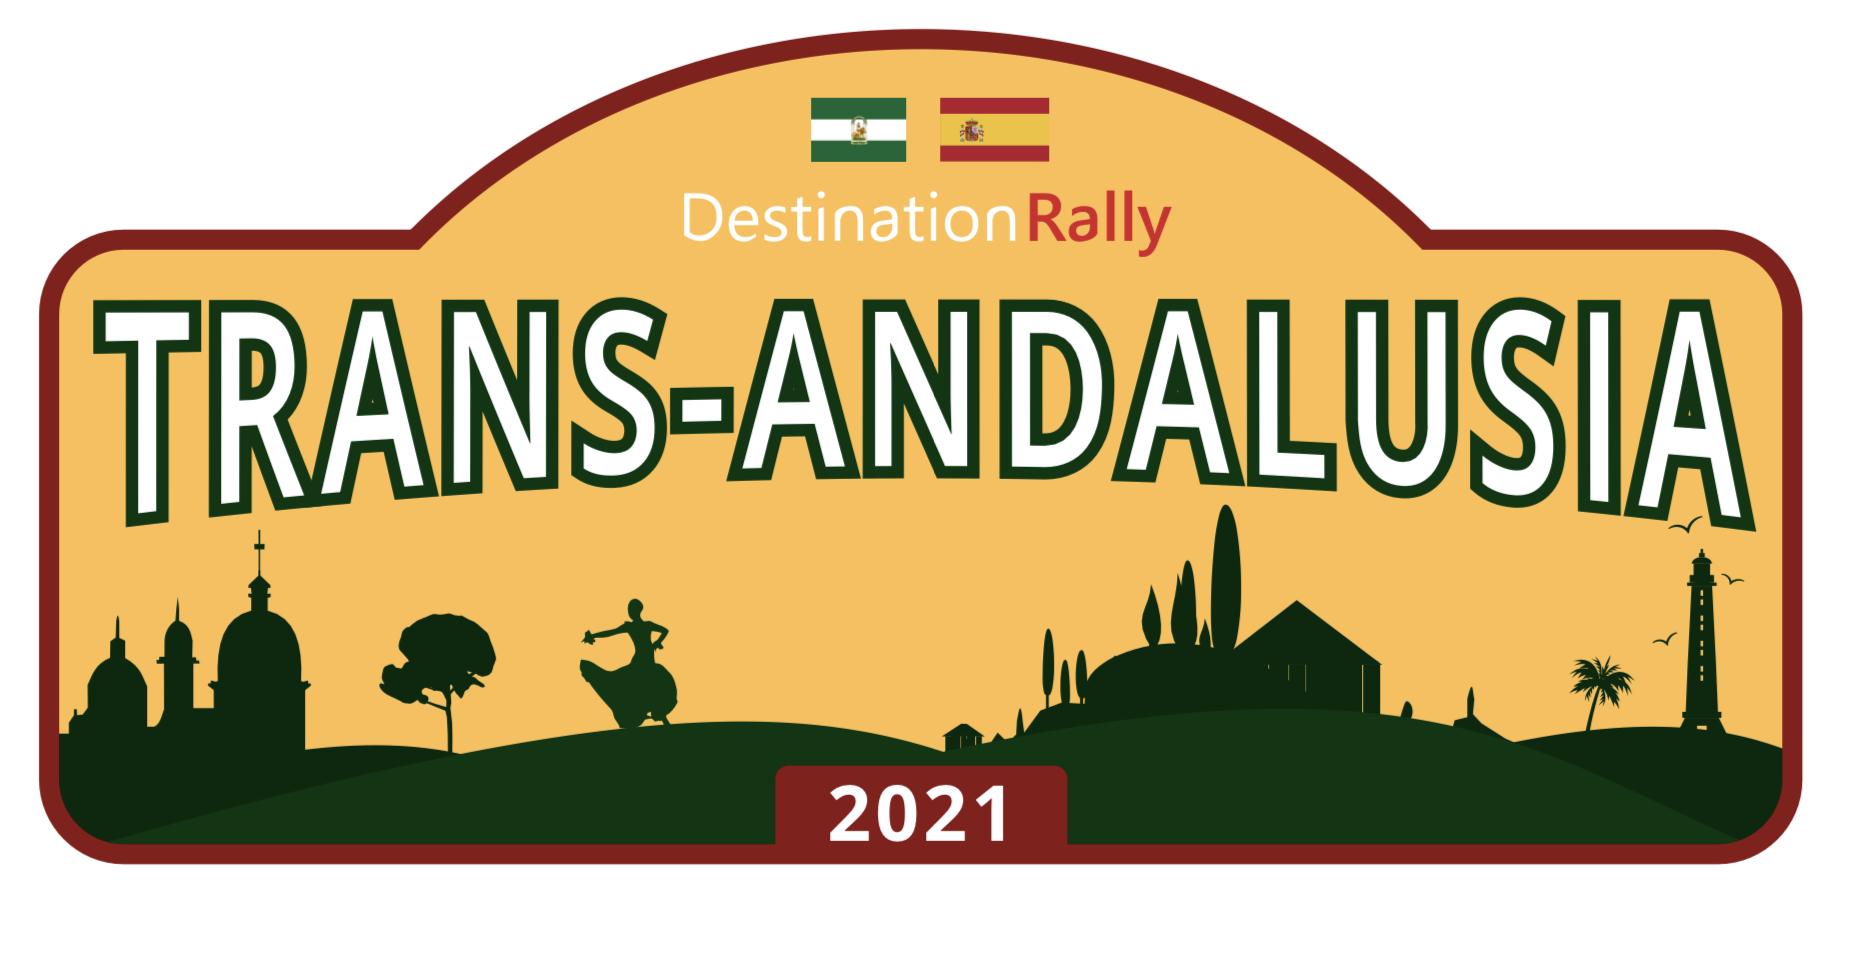 Destination Rally - Trans-Andalousia - Discovery